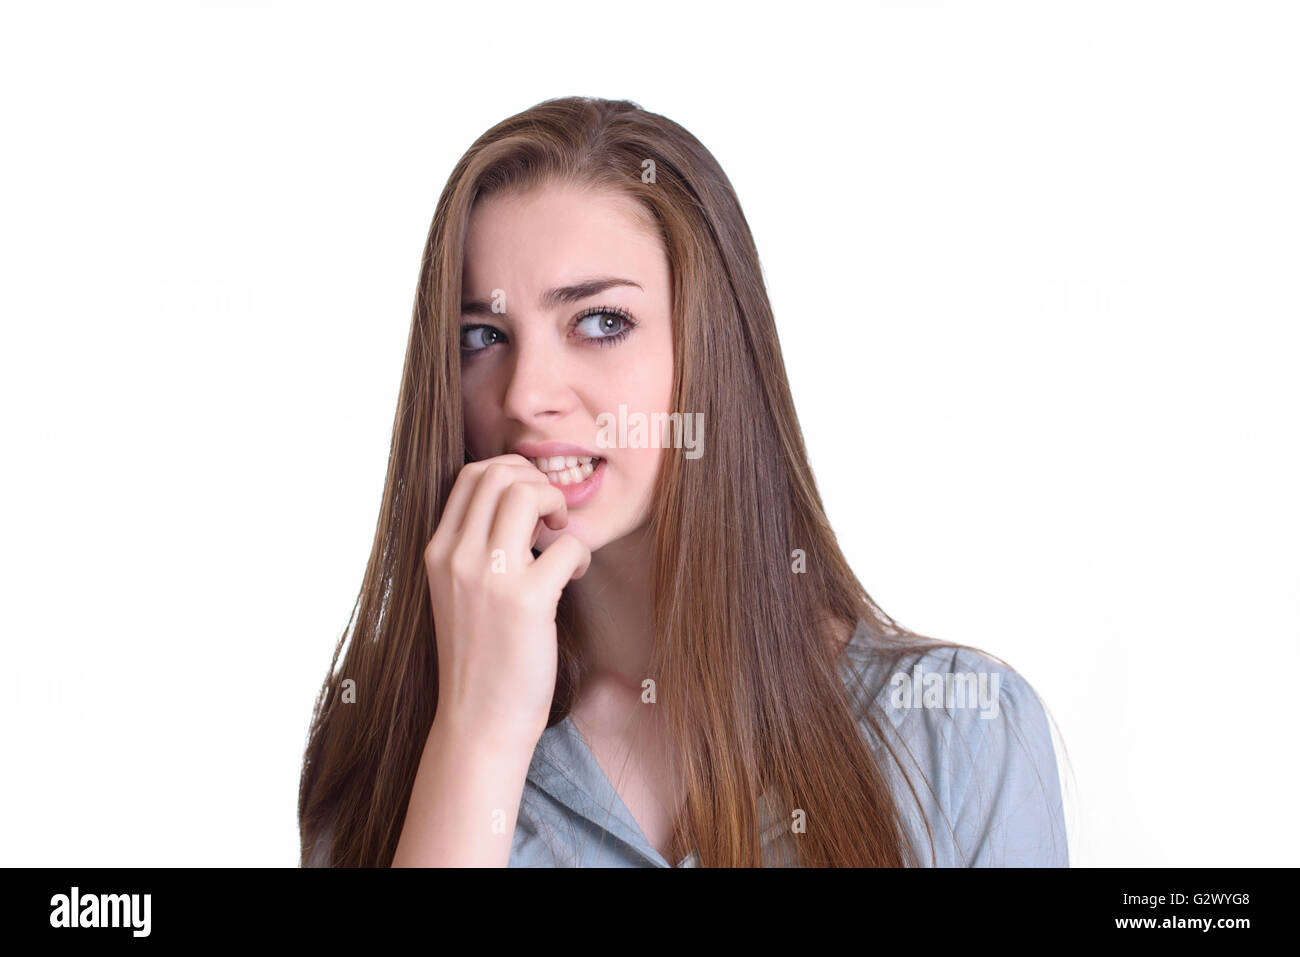 Jeune femme nerveux de mordre ses ongles Photo Stock